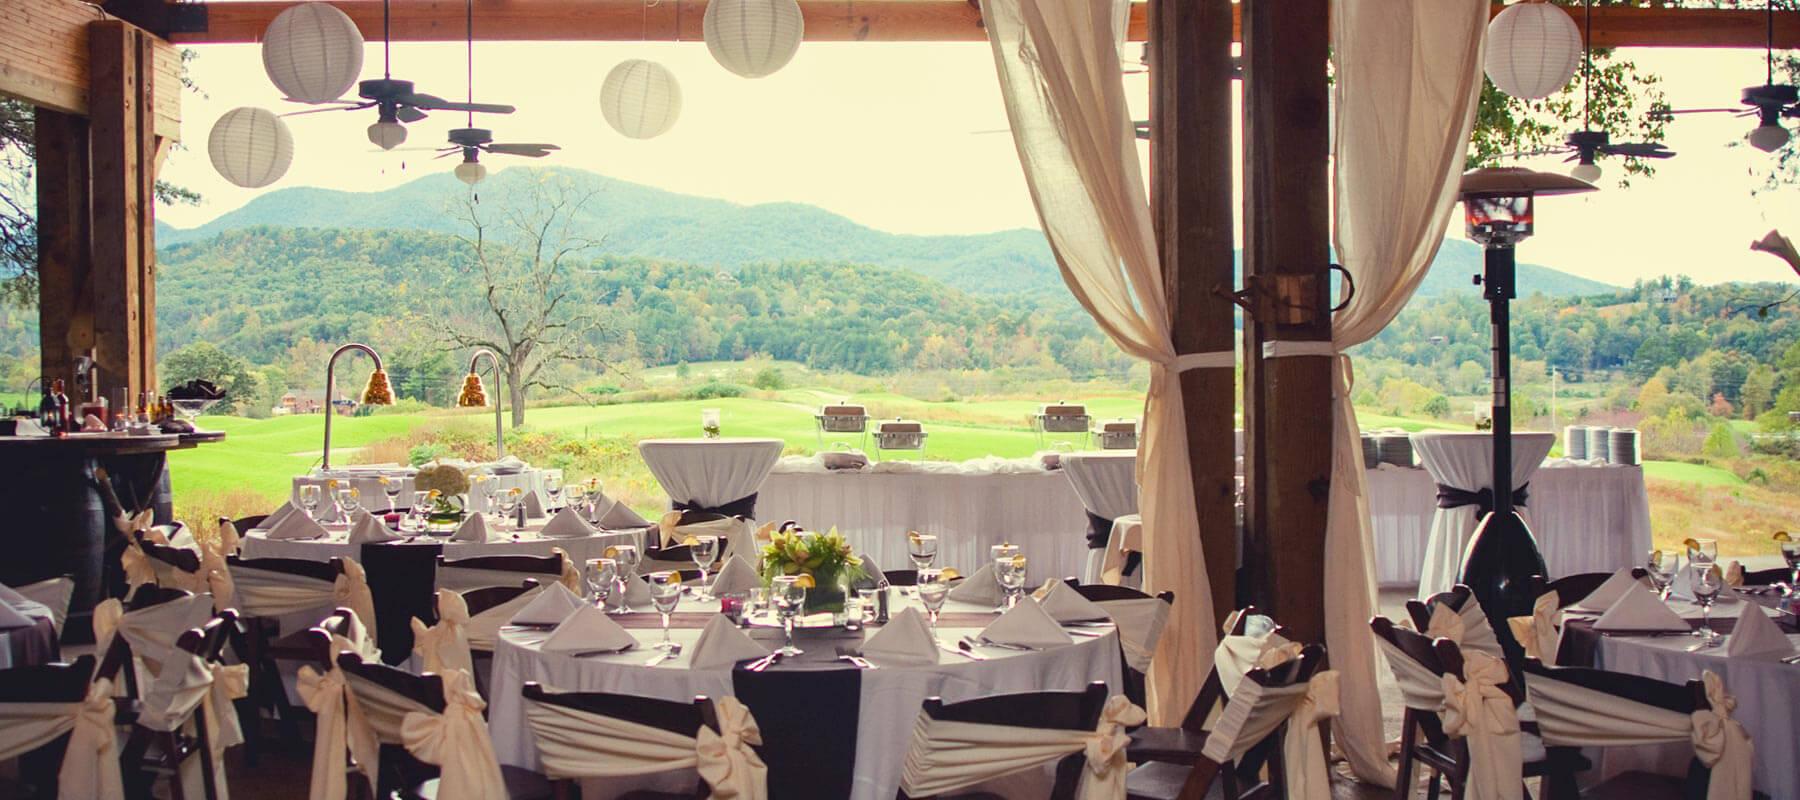 Brtown Valley Blue Ridge Mountain Wedding Sunset Pavilion